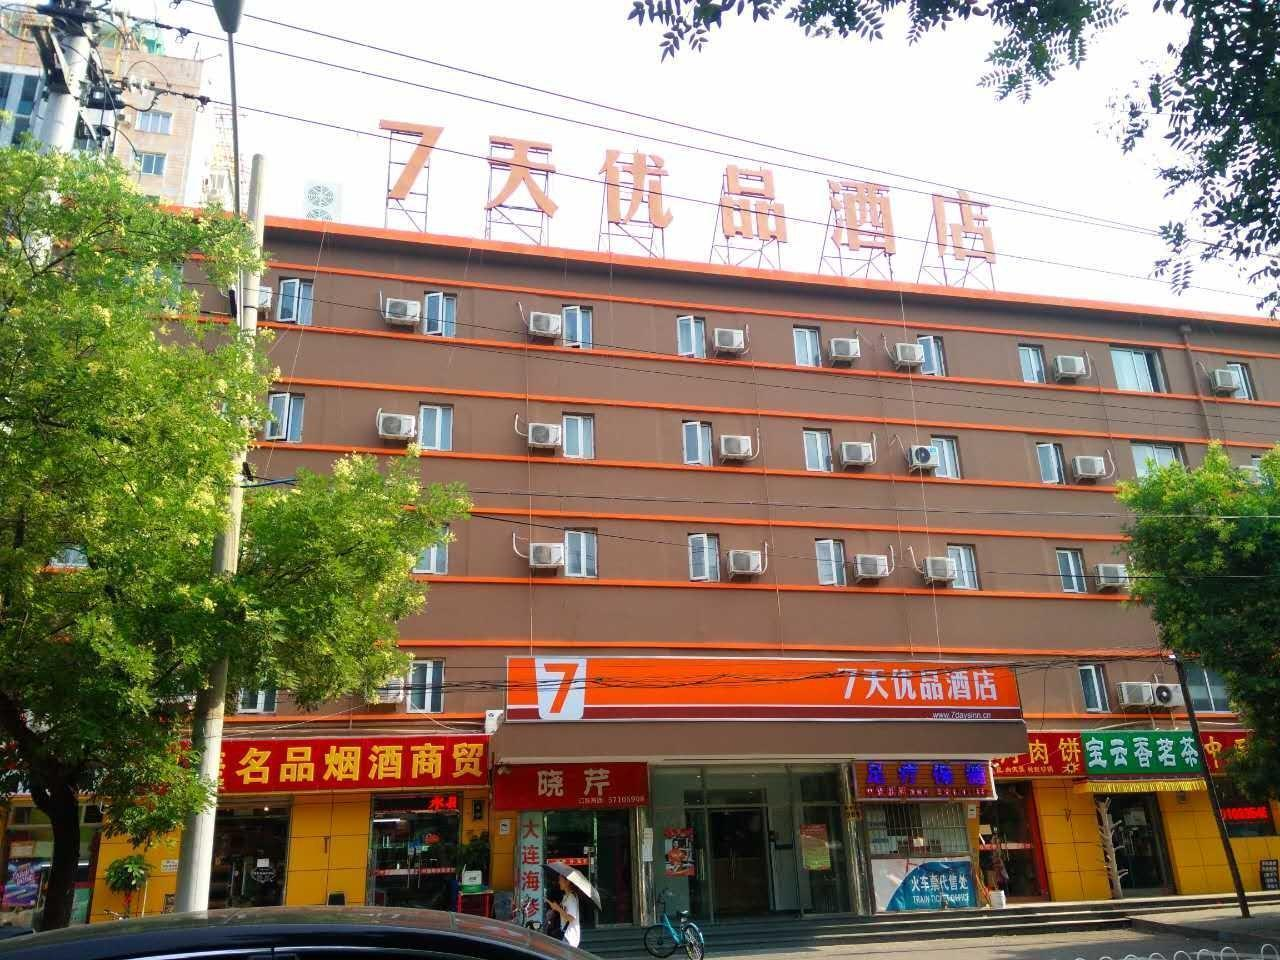 7 Days Premium�Beijing Huang Temple